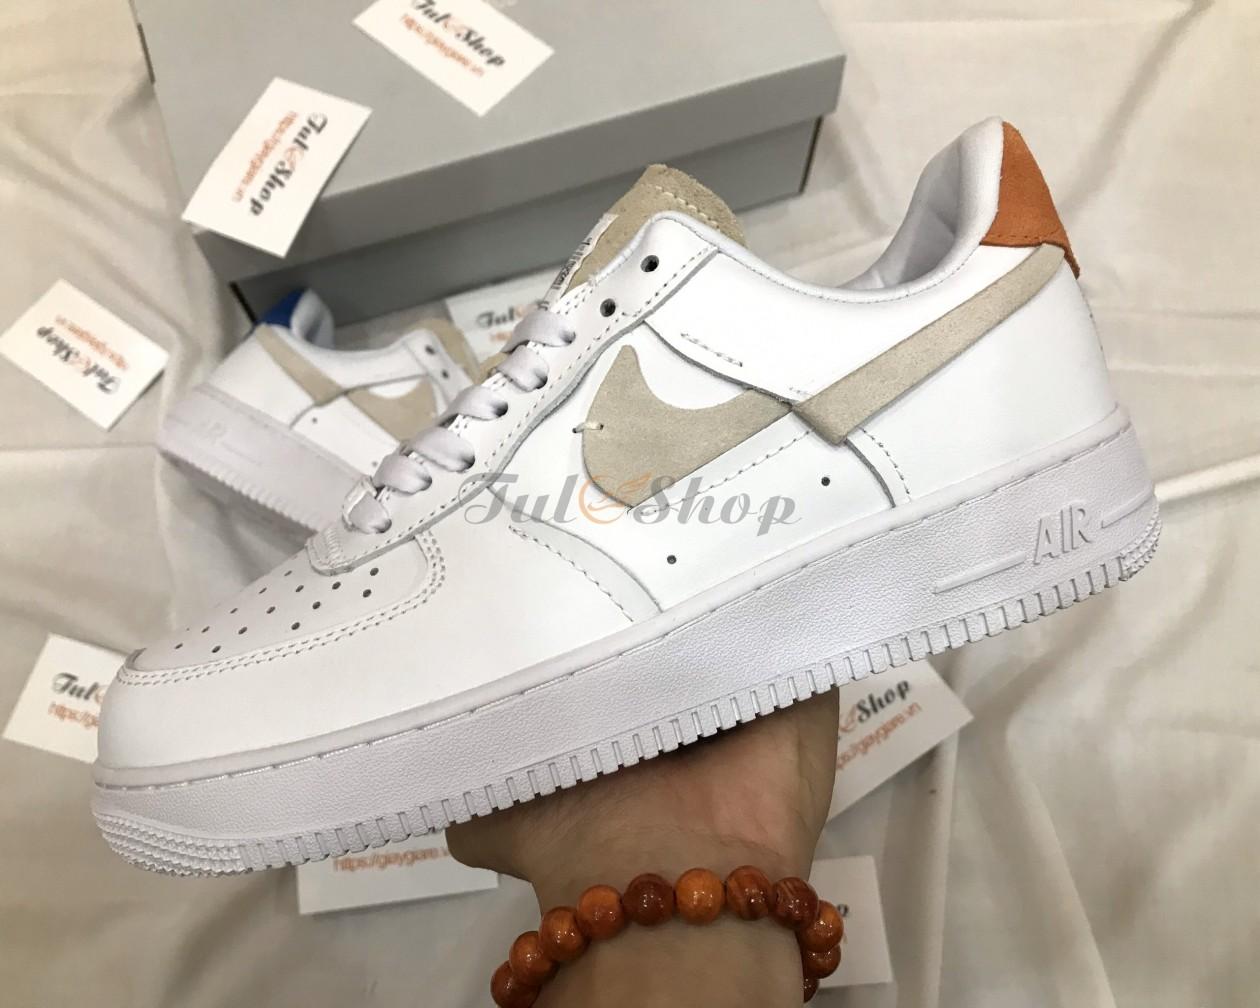 Nike Air Force 1 07 LUX - White/Platinum Tint